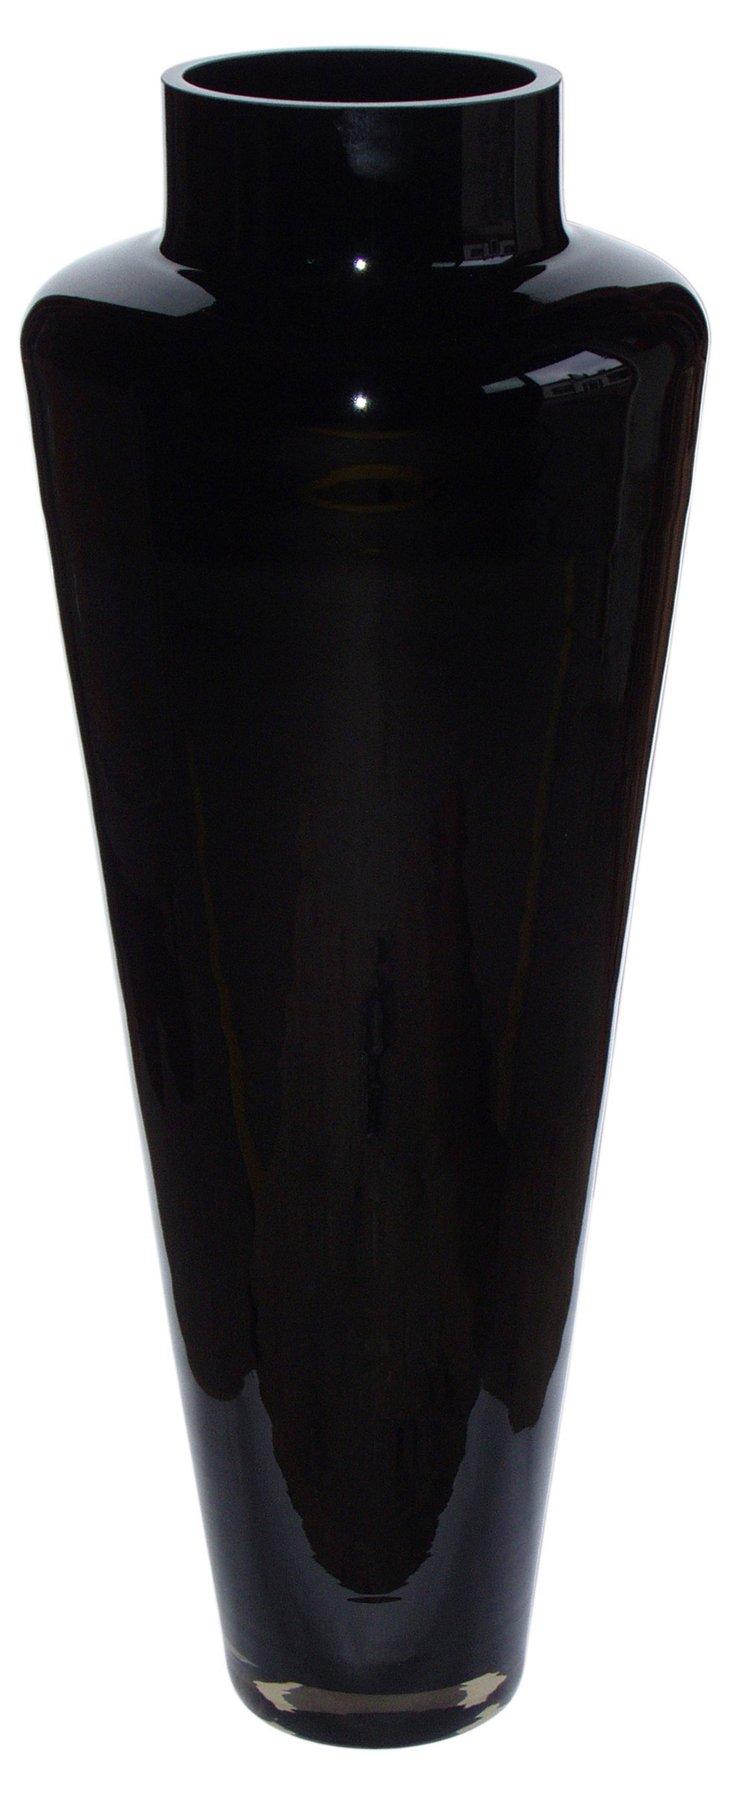 Dior Glass Vase, Black